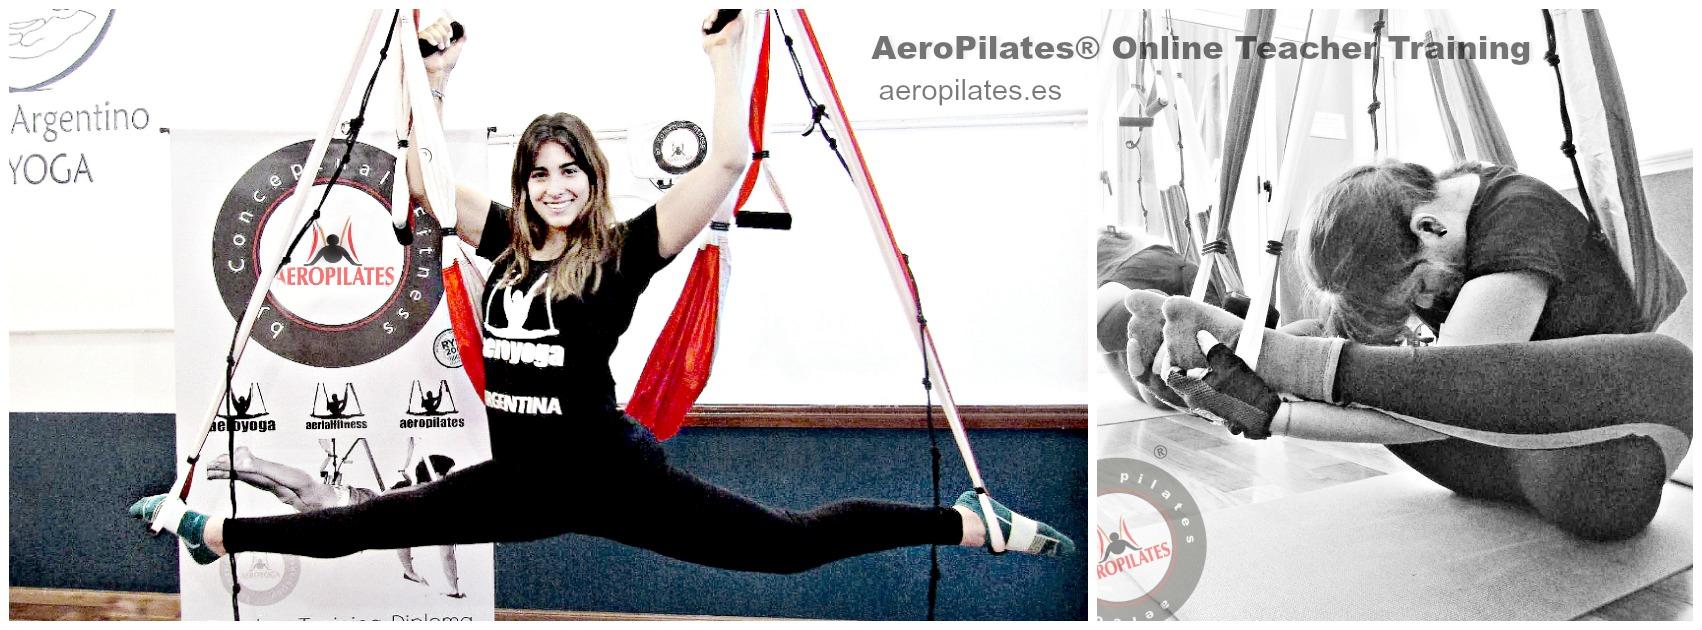 AeroPilates OnLine! Visita Nossa Aula Virtual Gratuita, Video!